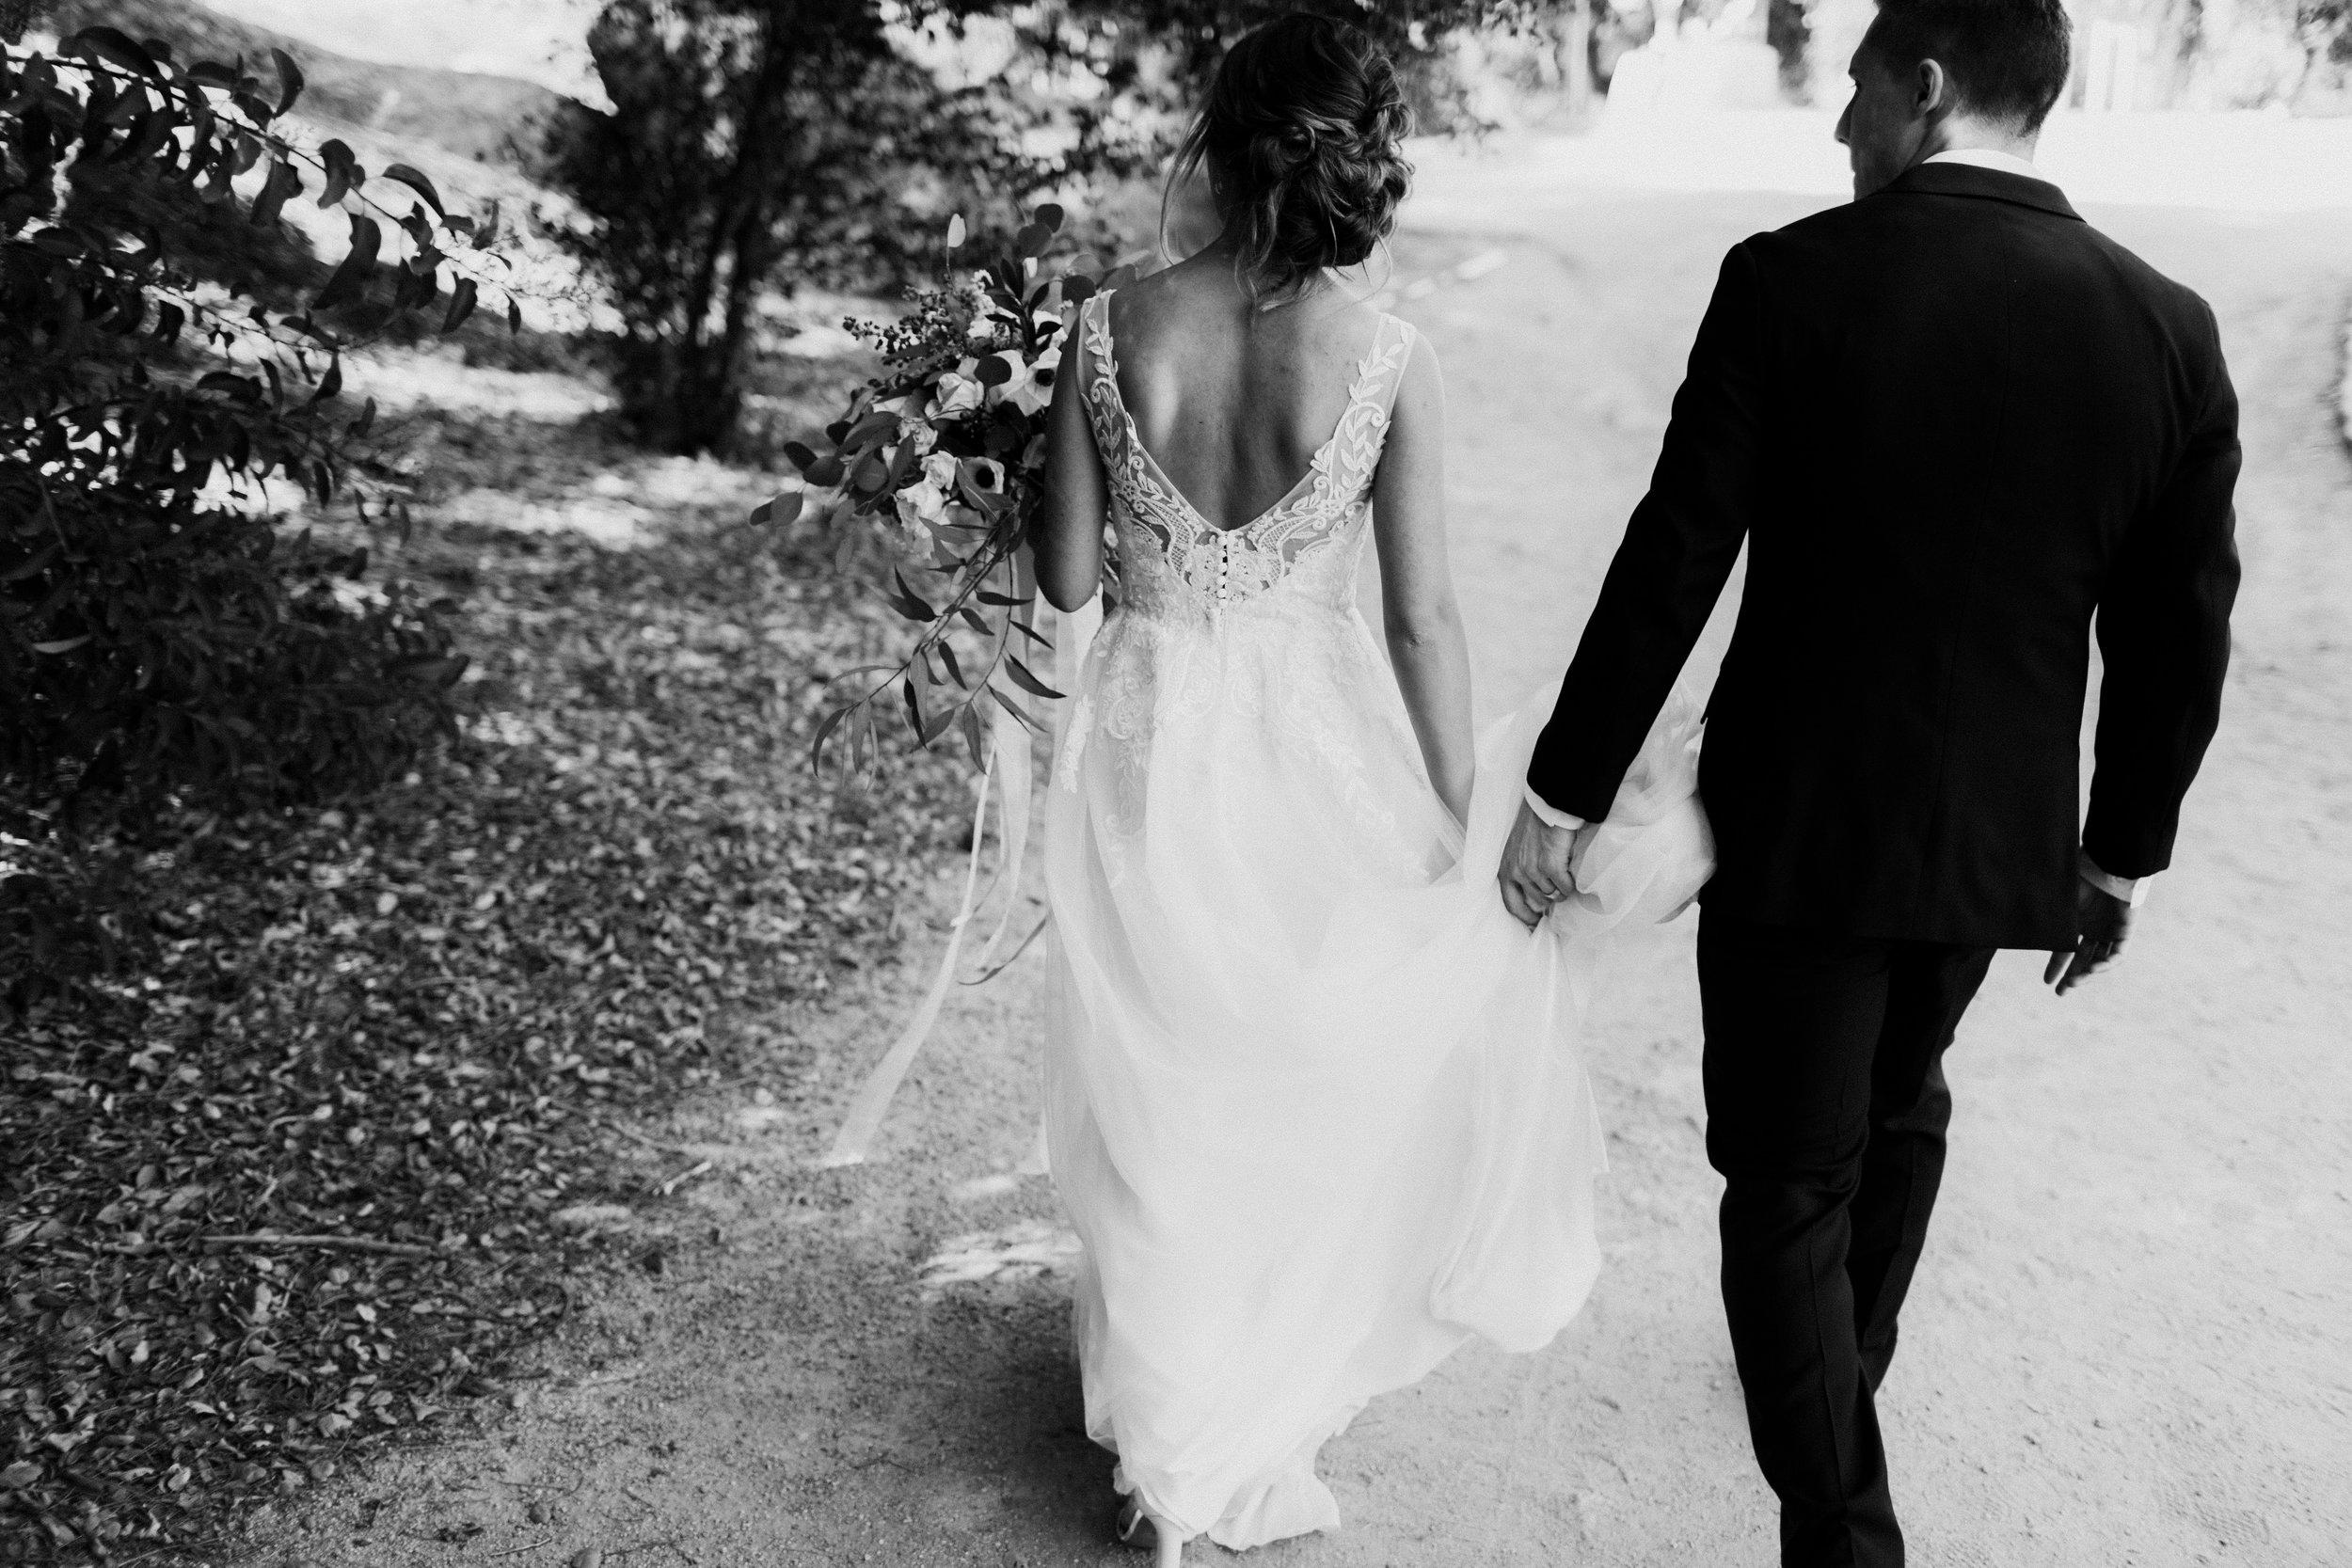 kate+zack_wedding_secludedgardenestate_temecula_madisonrylee_0739.jpg